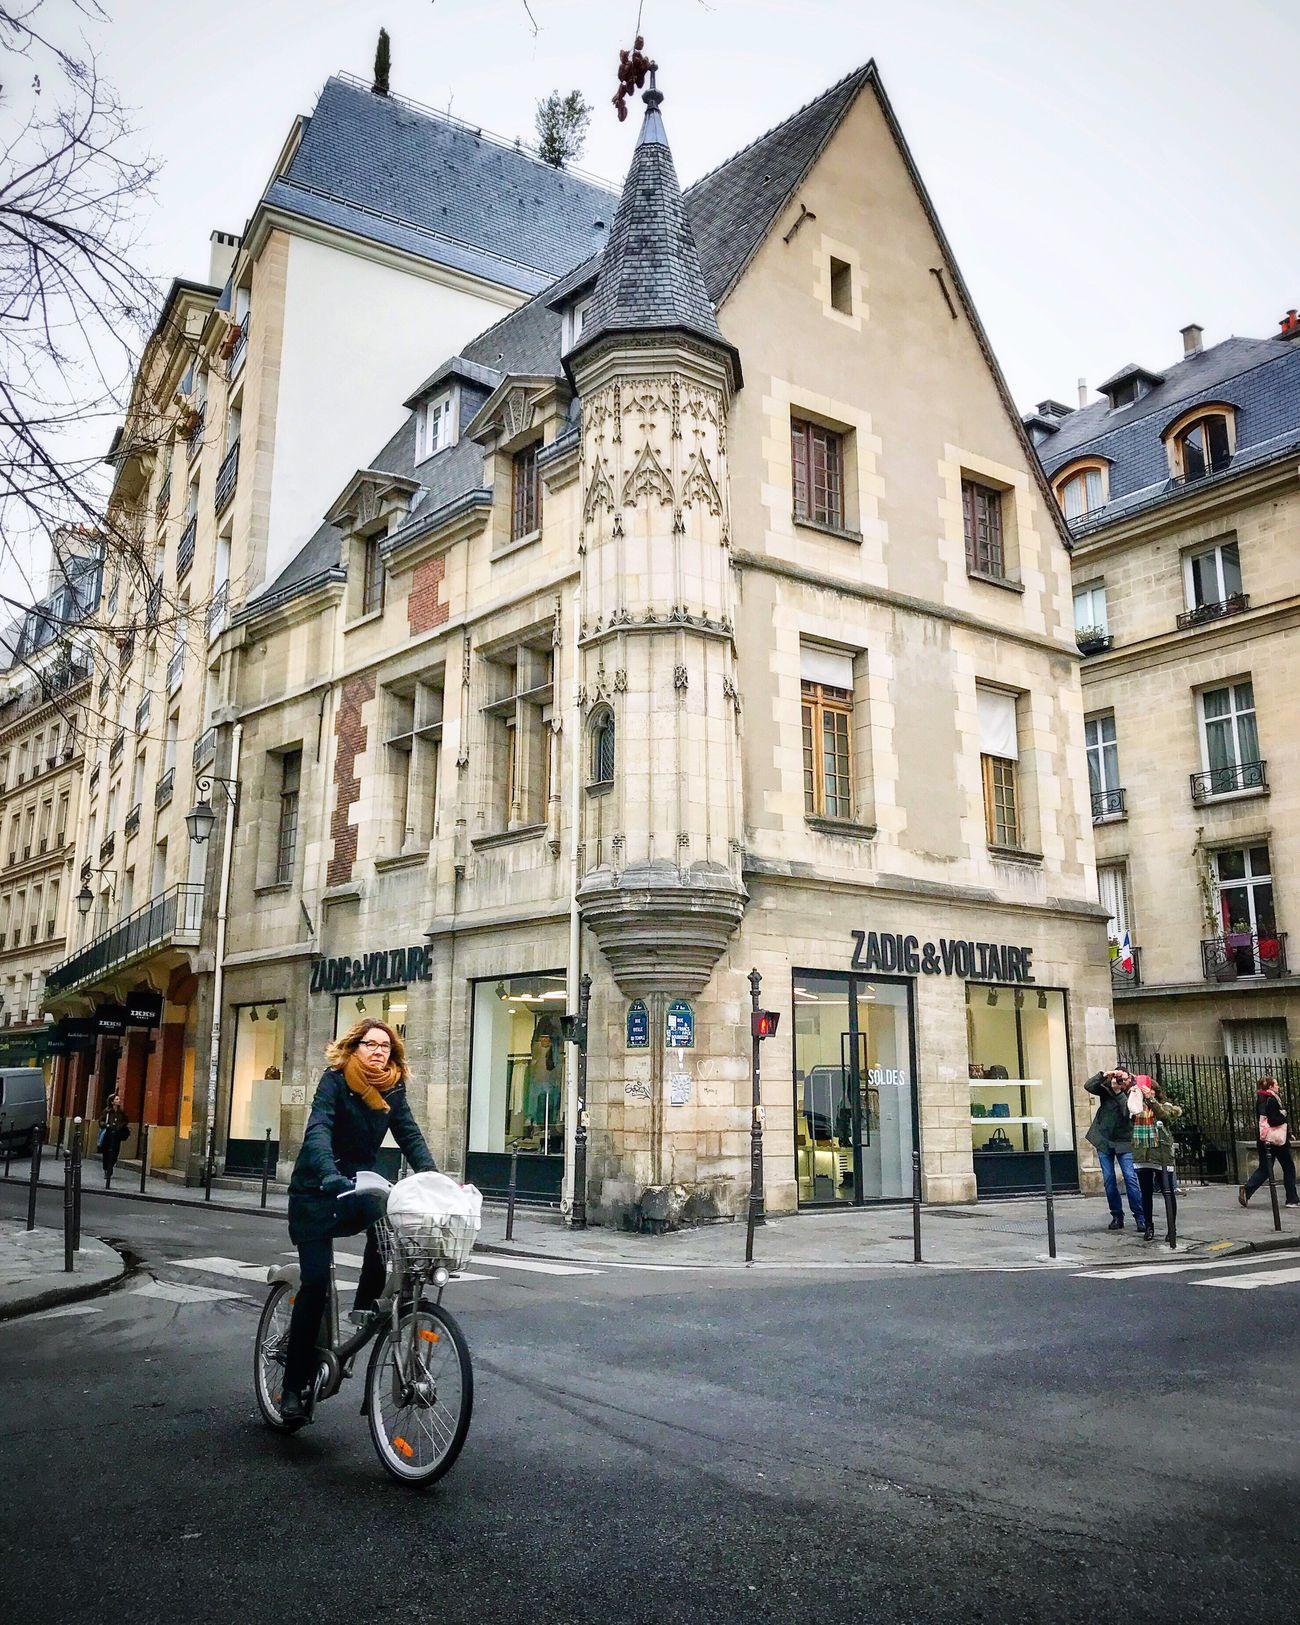 Happy Friday! Bonsoir Paris! Architecture Building Exterior Bicycle Travel Destinations Photooftheday Paris Eyem Best Shot - Architecture EyeEm Best Shots Parisweloveyou Architecture